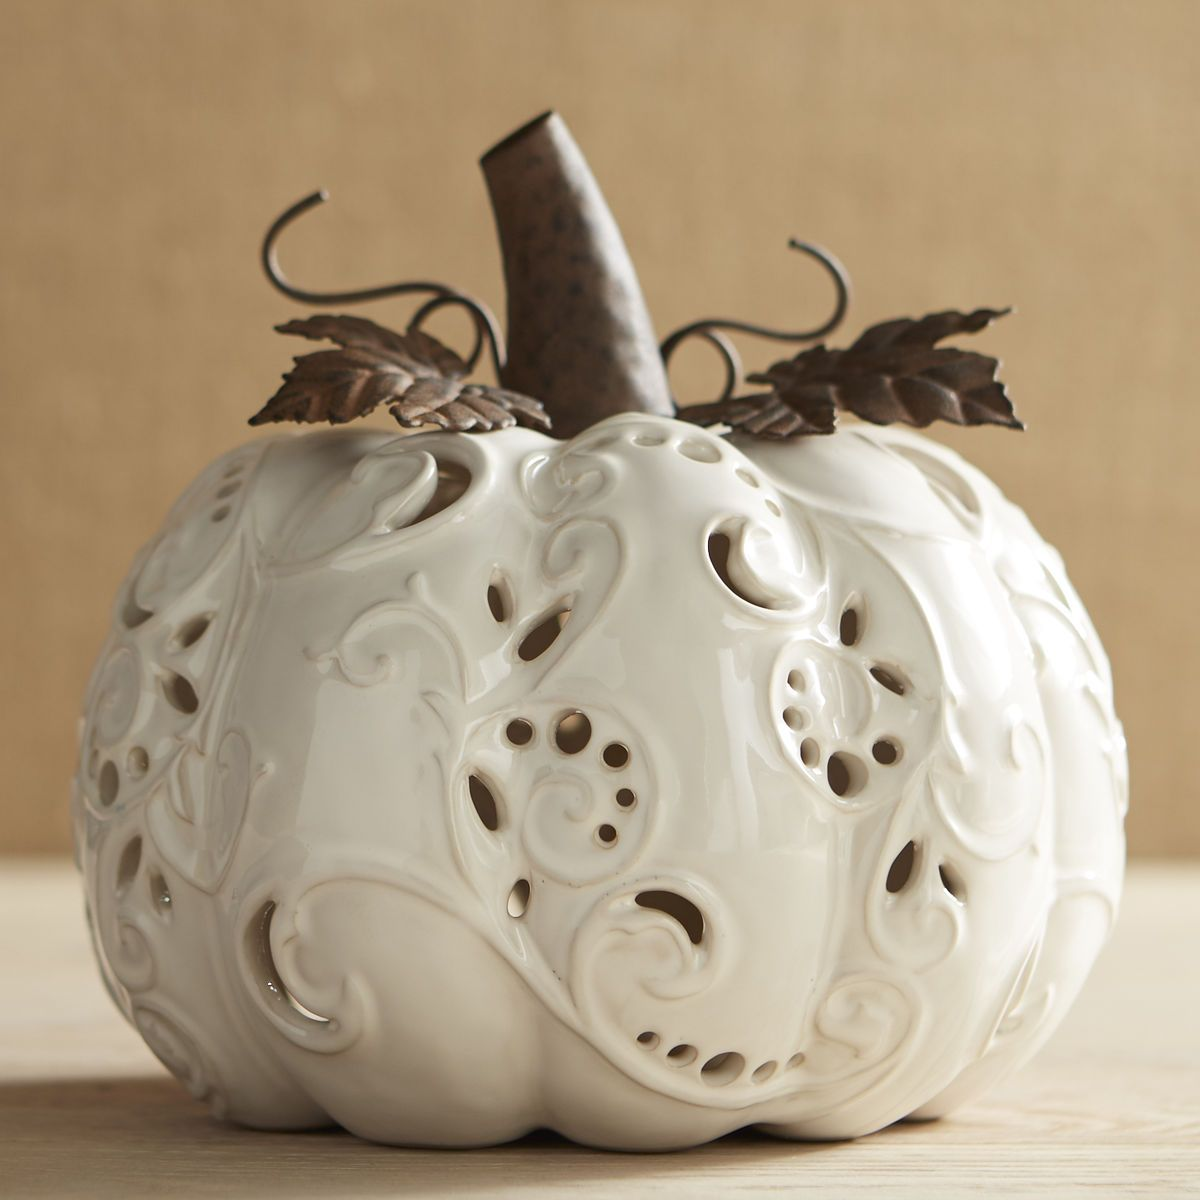 Large Ceramic Ivory Pumpkin Tealight Candle Holder Pier 1